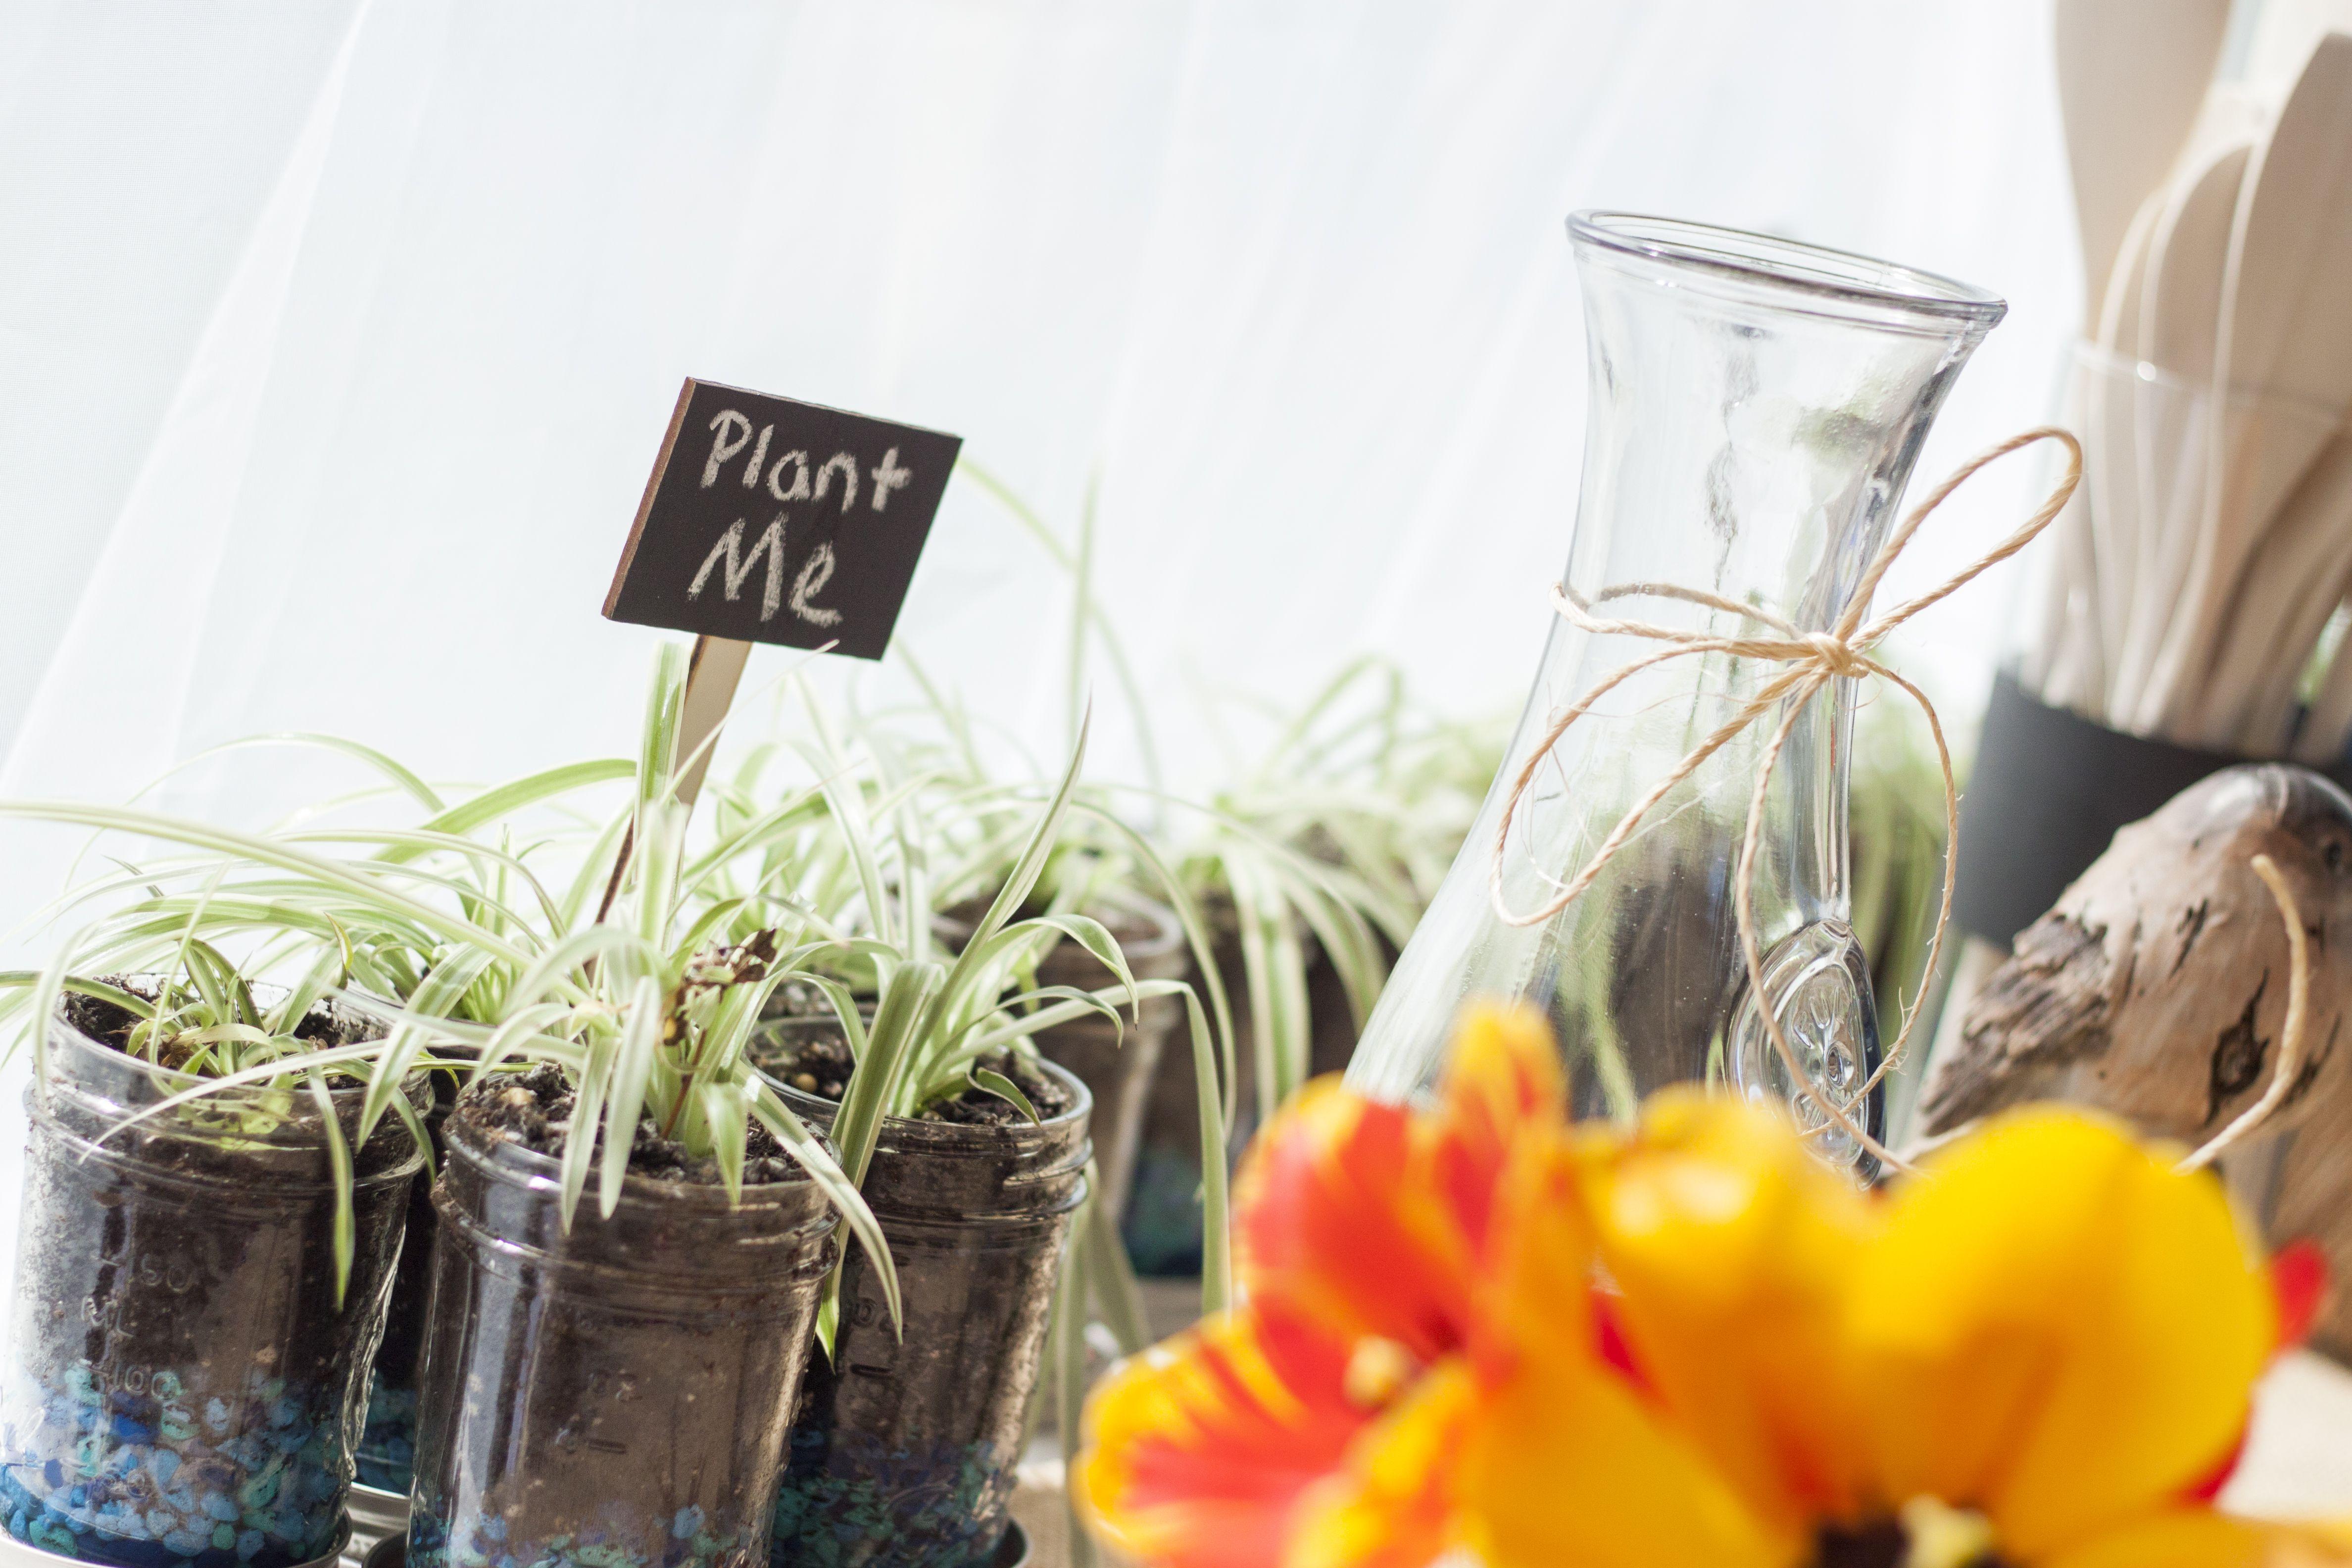 Spider-plant favors | Rustic Wedding | Pinterest | Spider plants ...